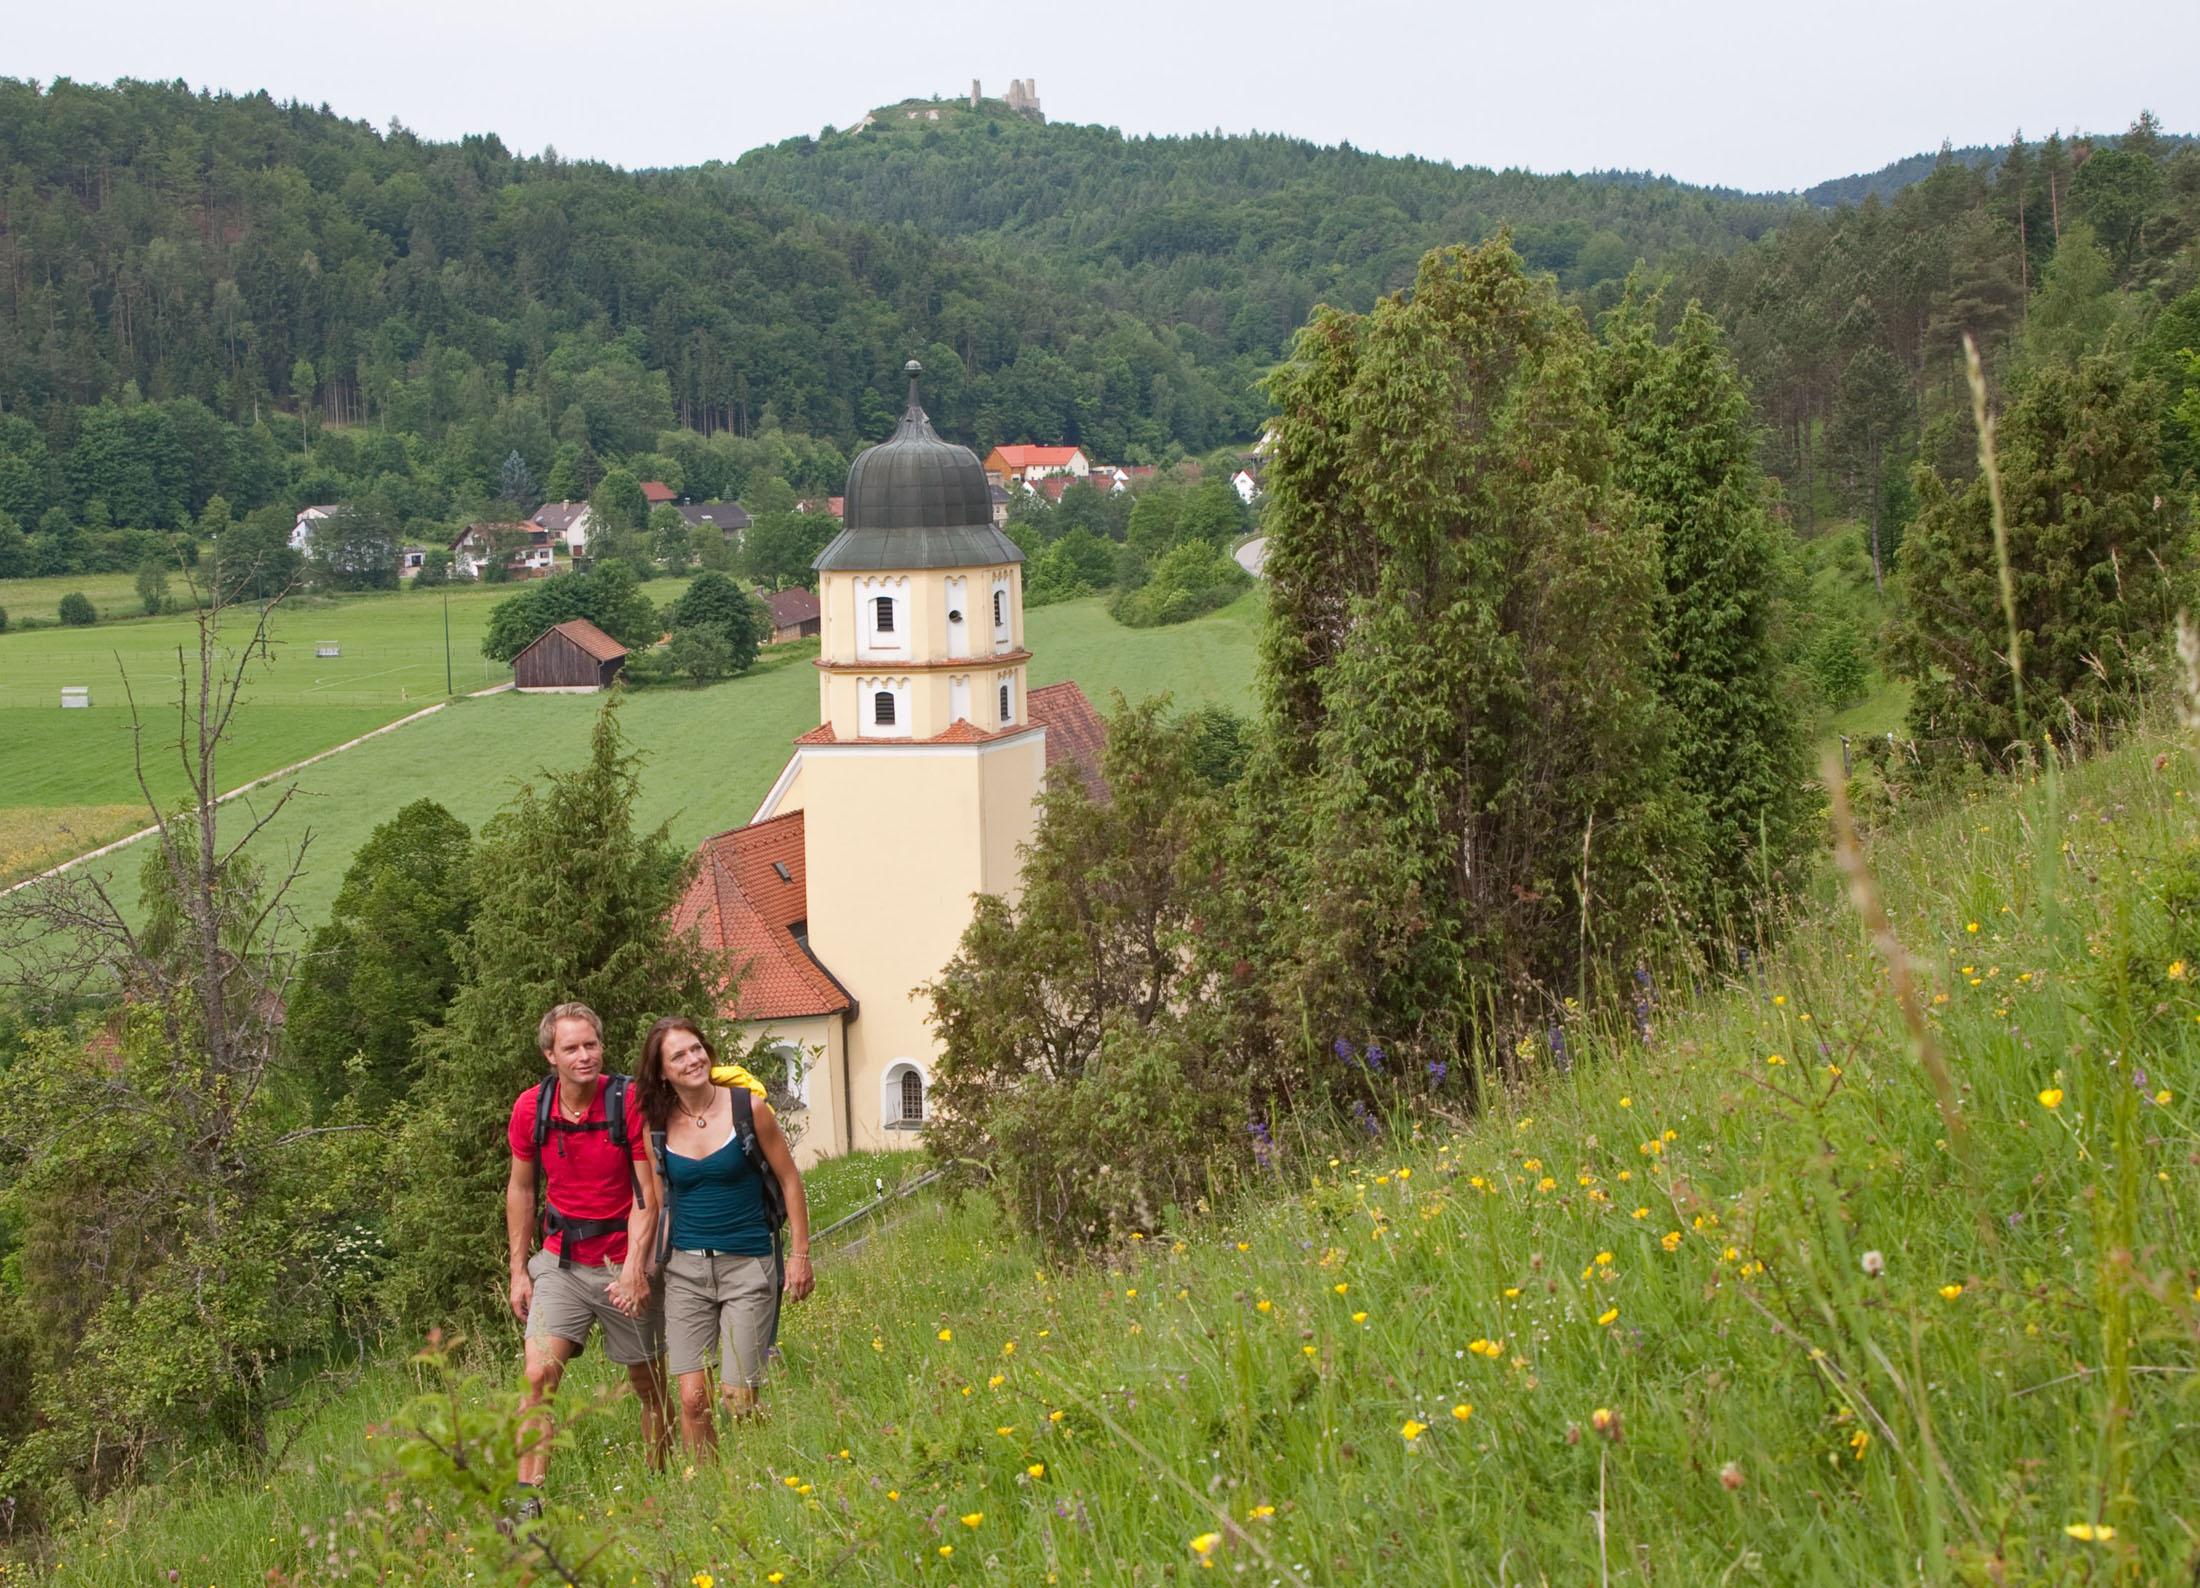 Pilgrimage church Stettkirchen - Wallfahrtskirche Stettkirchen